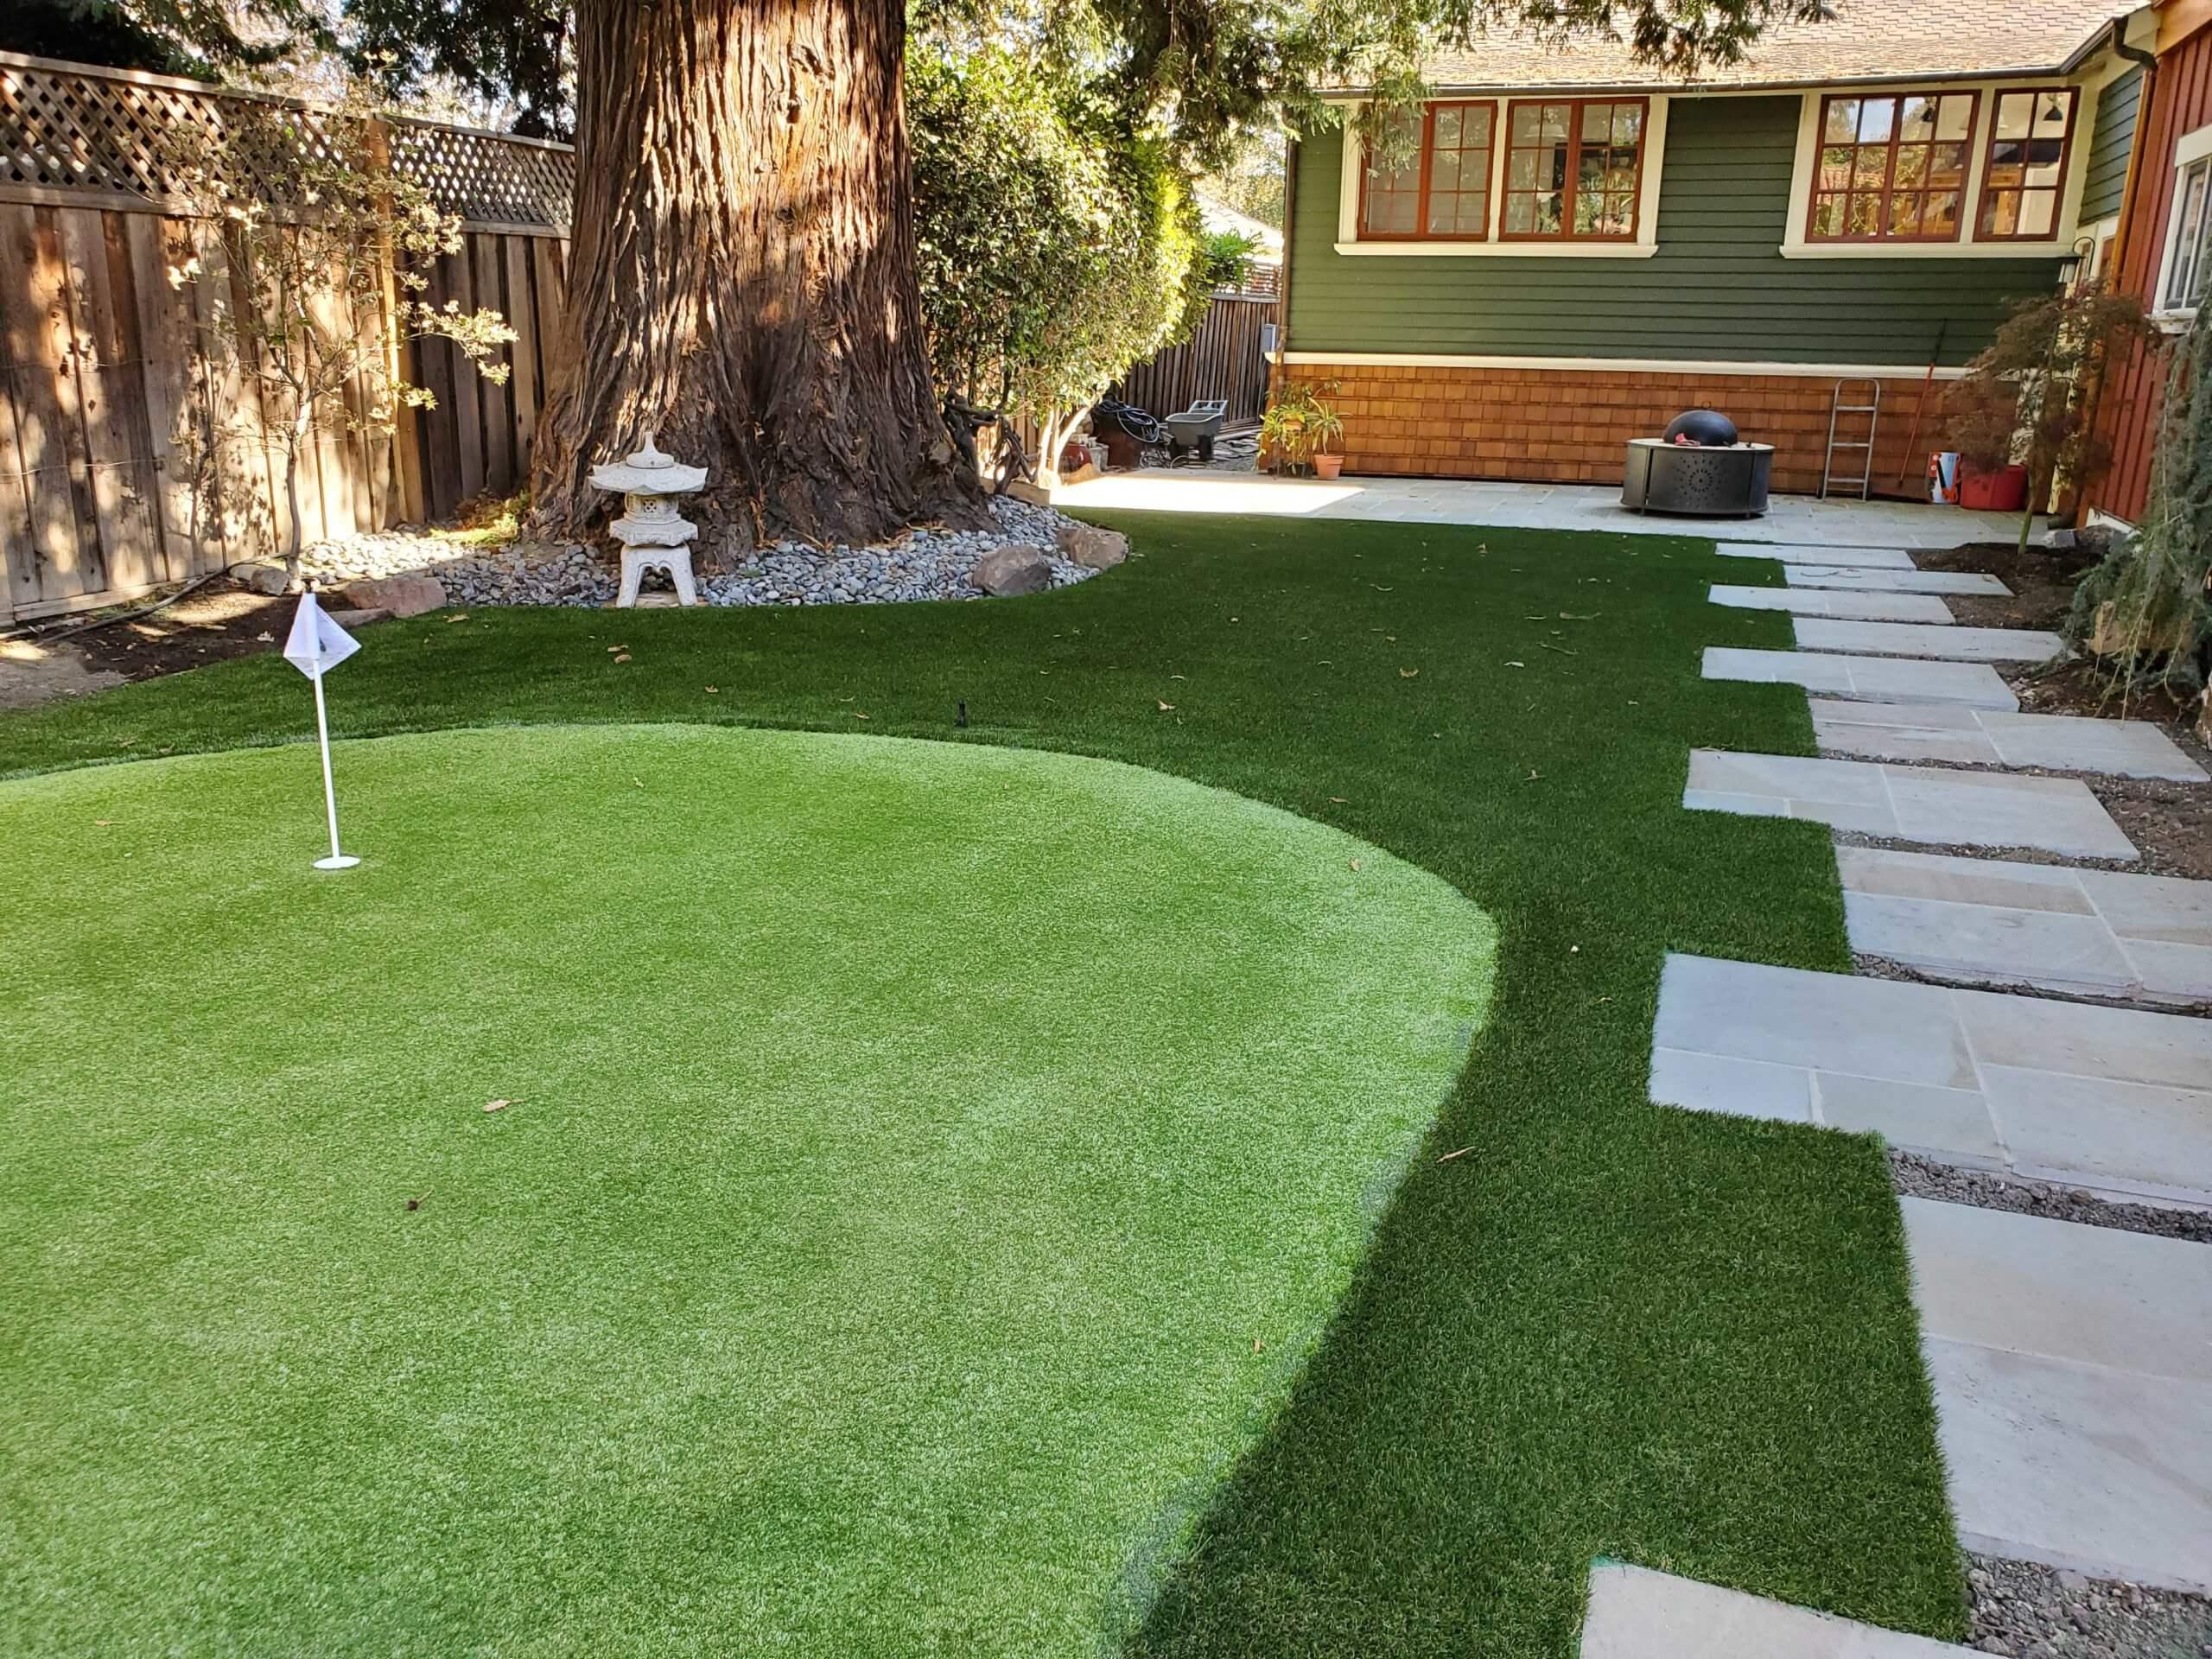 backyard putting greens with artificial turf